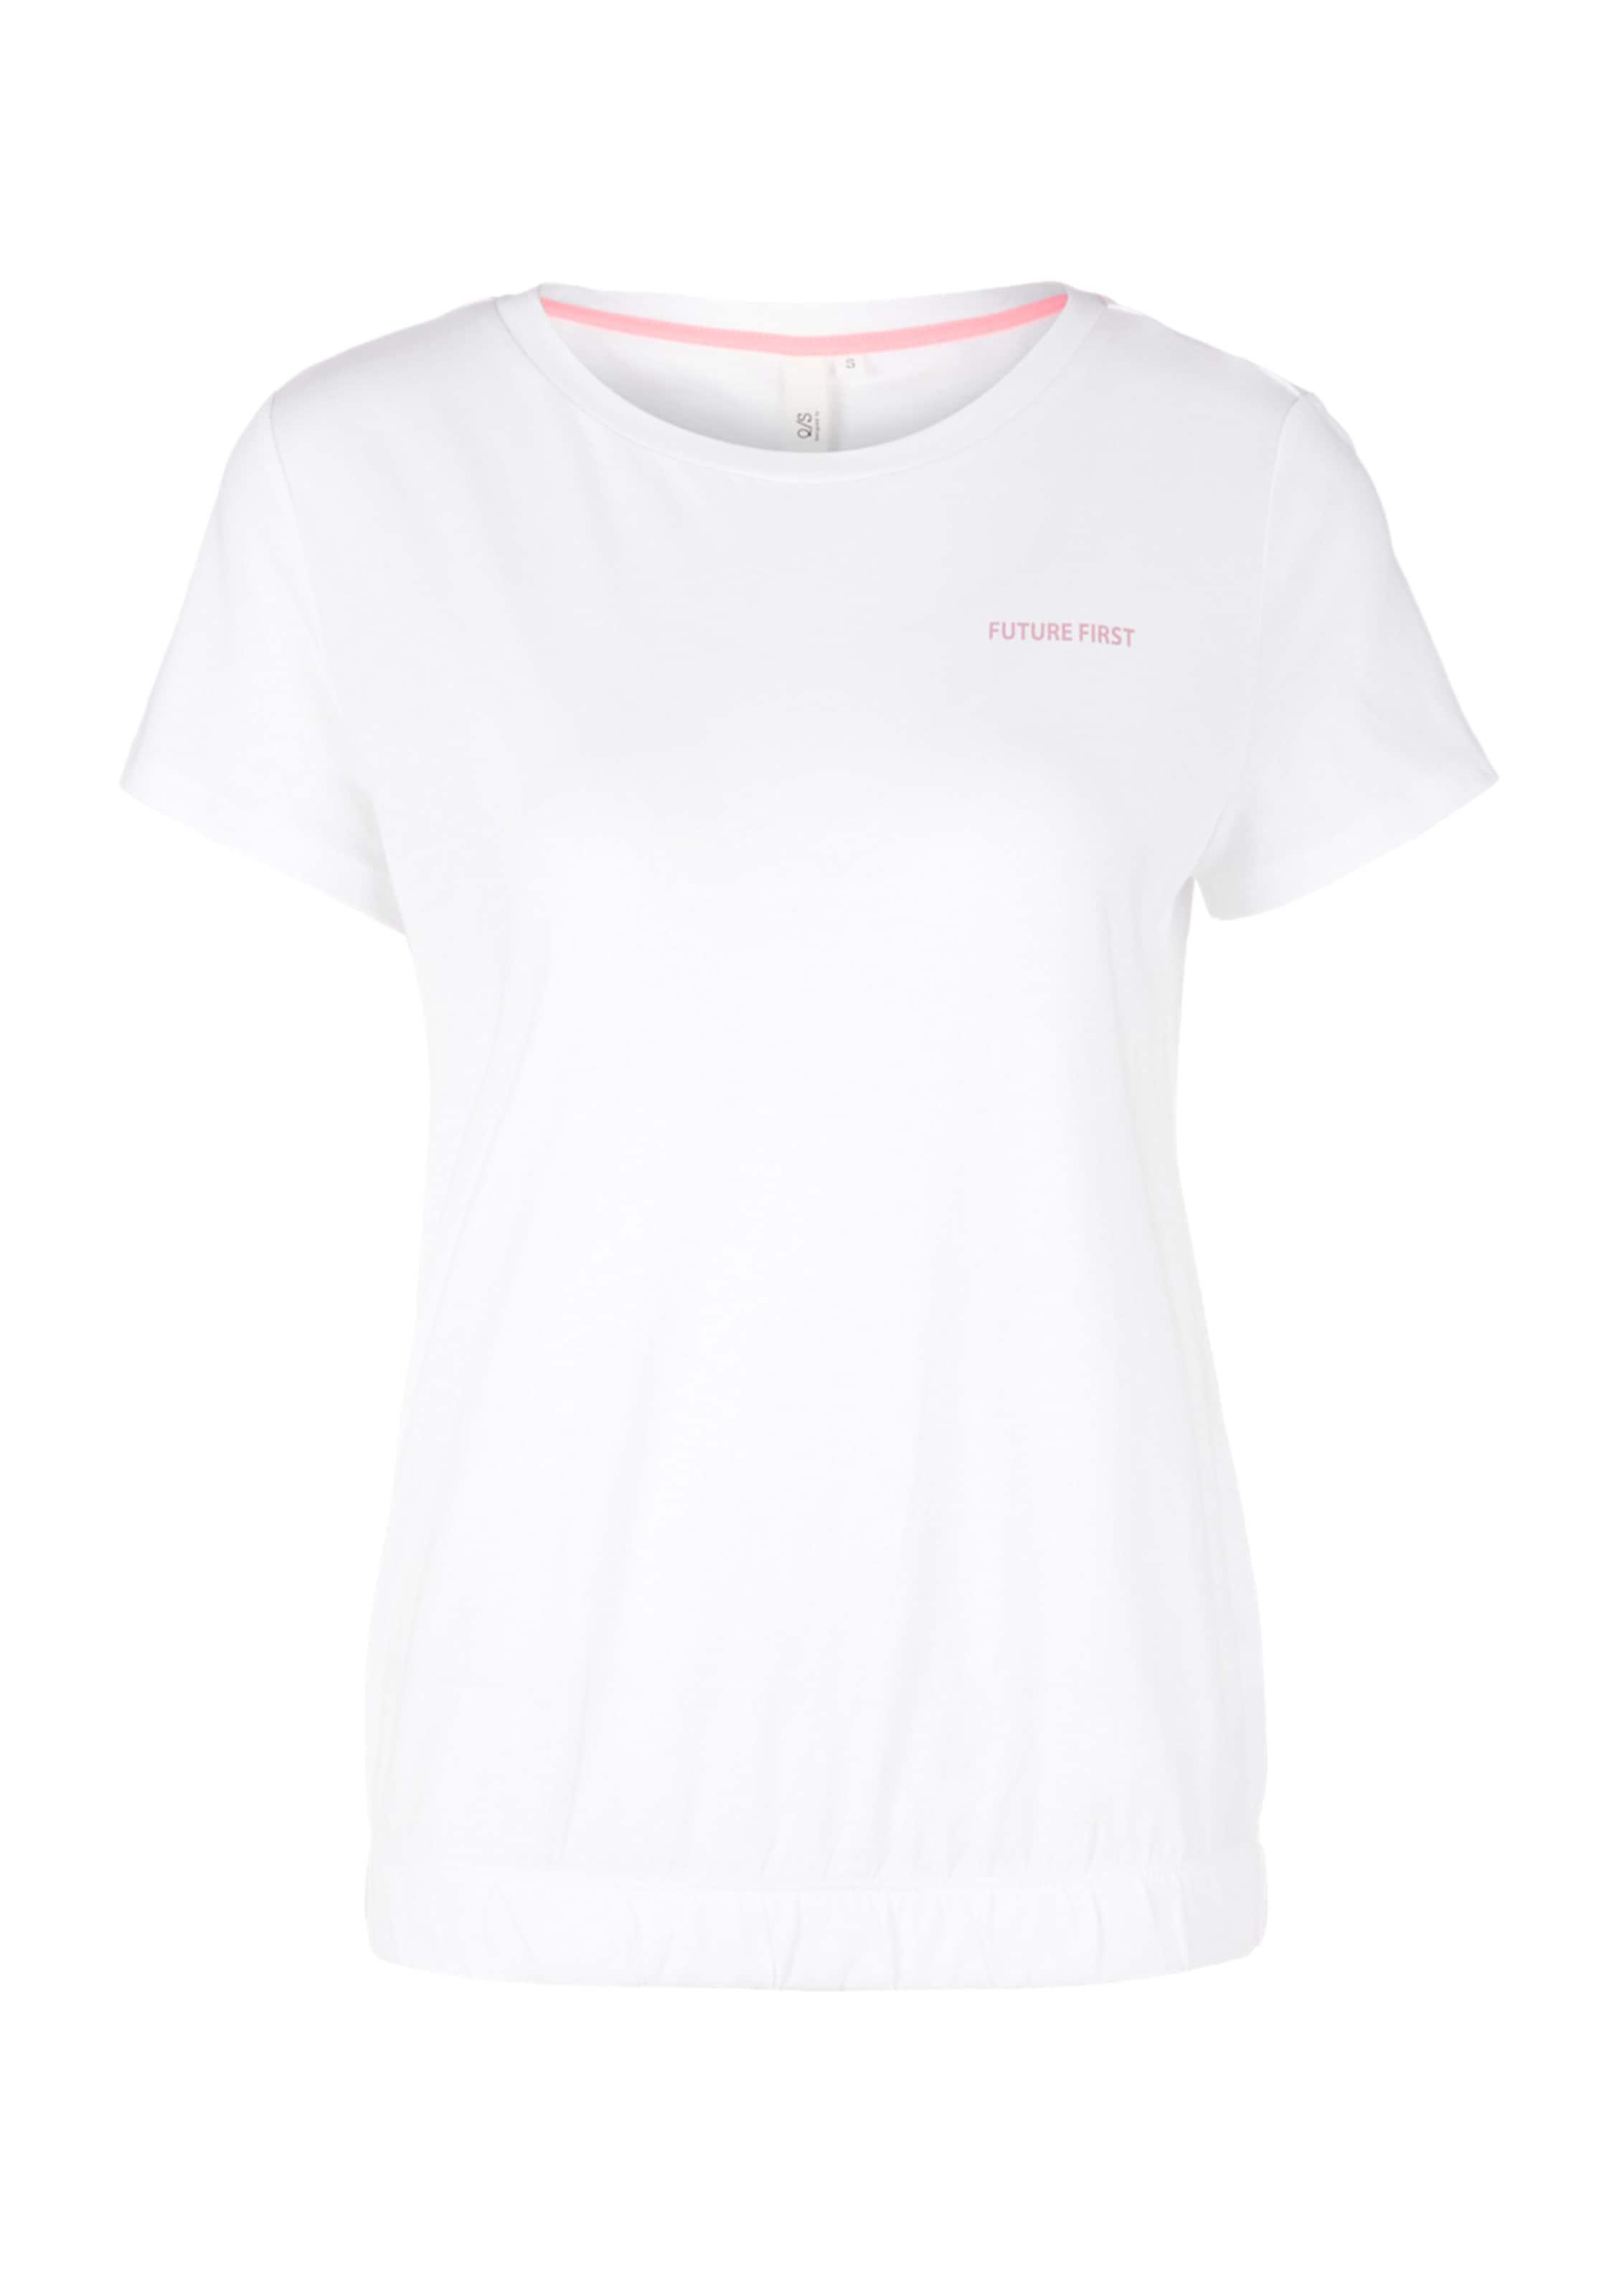 Designed HellpinkWeiß Q Shirt In s By 5A4Lq3Rj